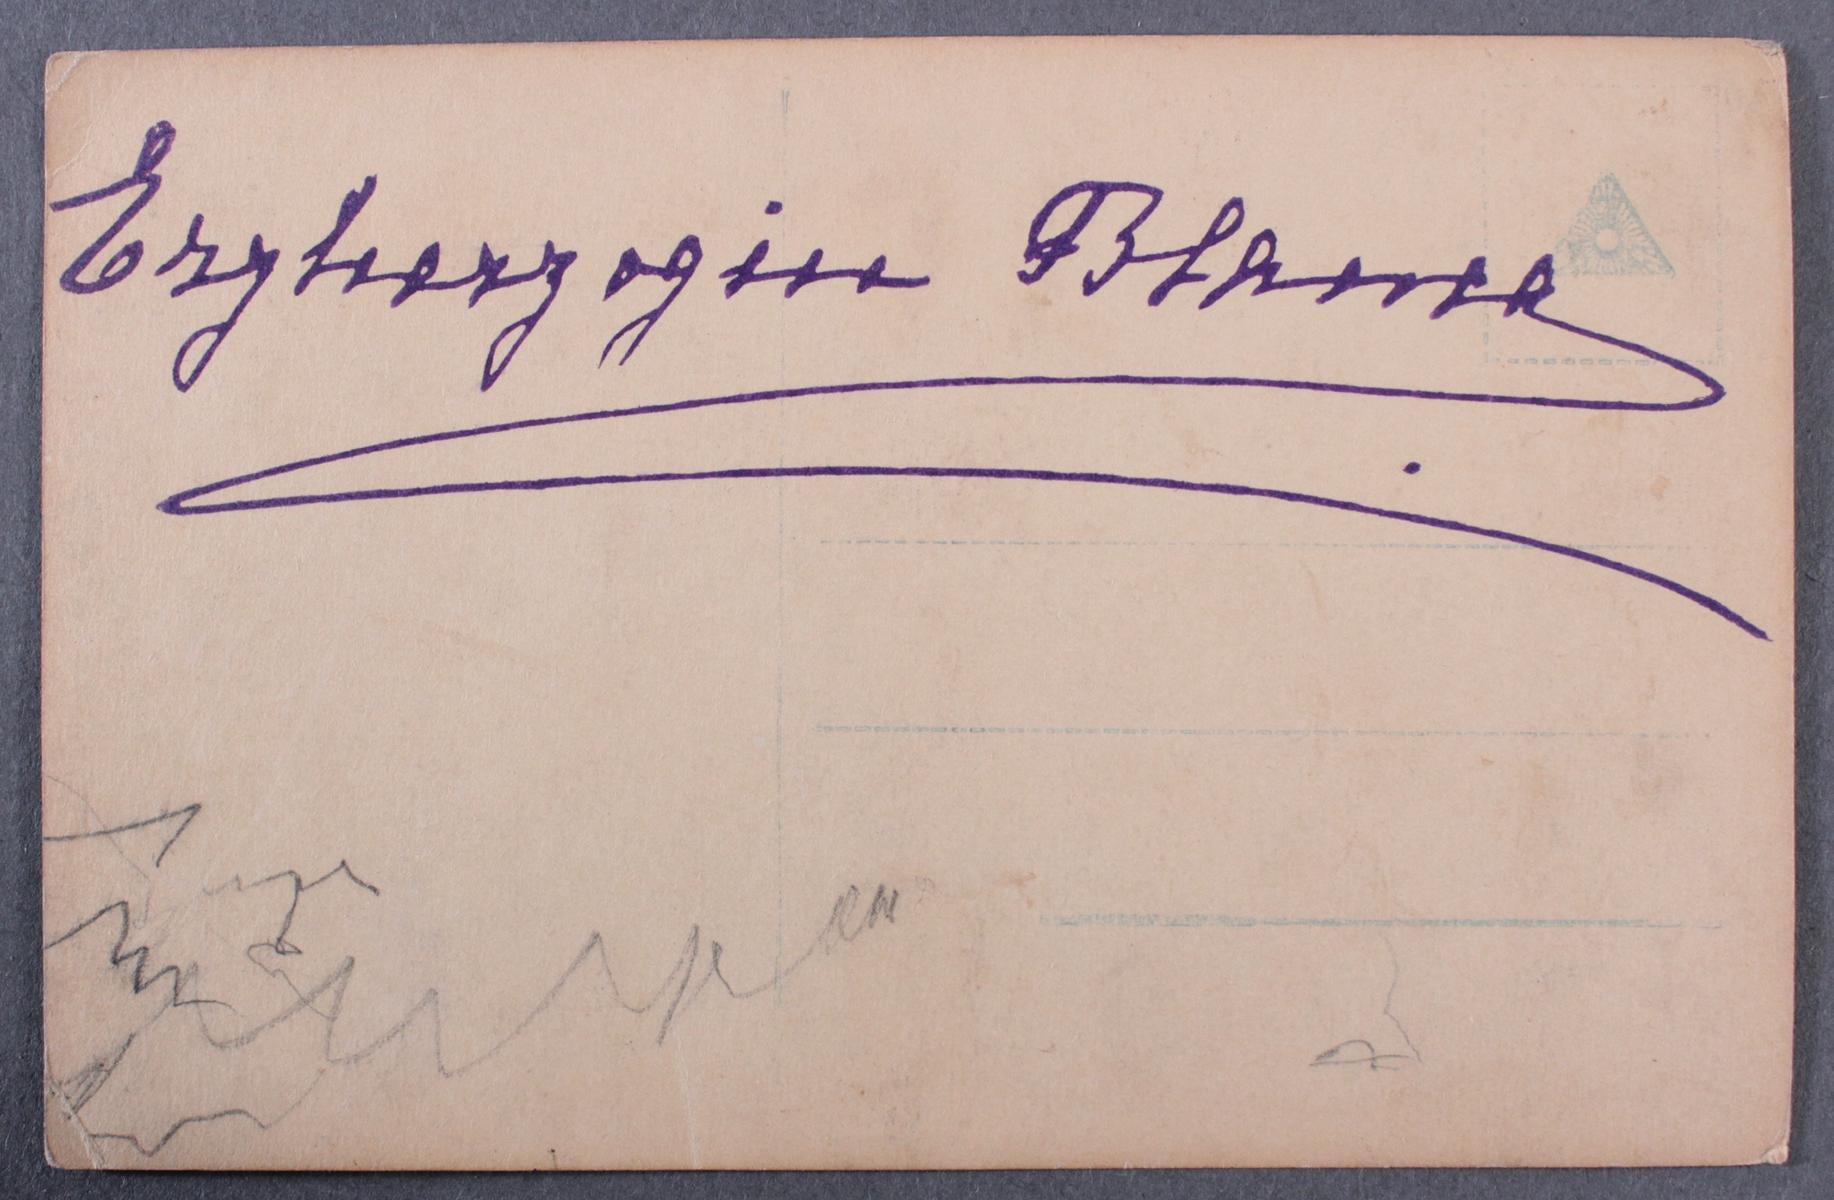 Postkarte mit Autograph Erzherzogin Blanca de Borbòn (1868-1949)-4